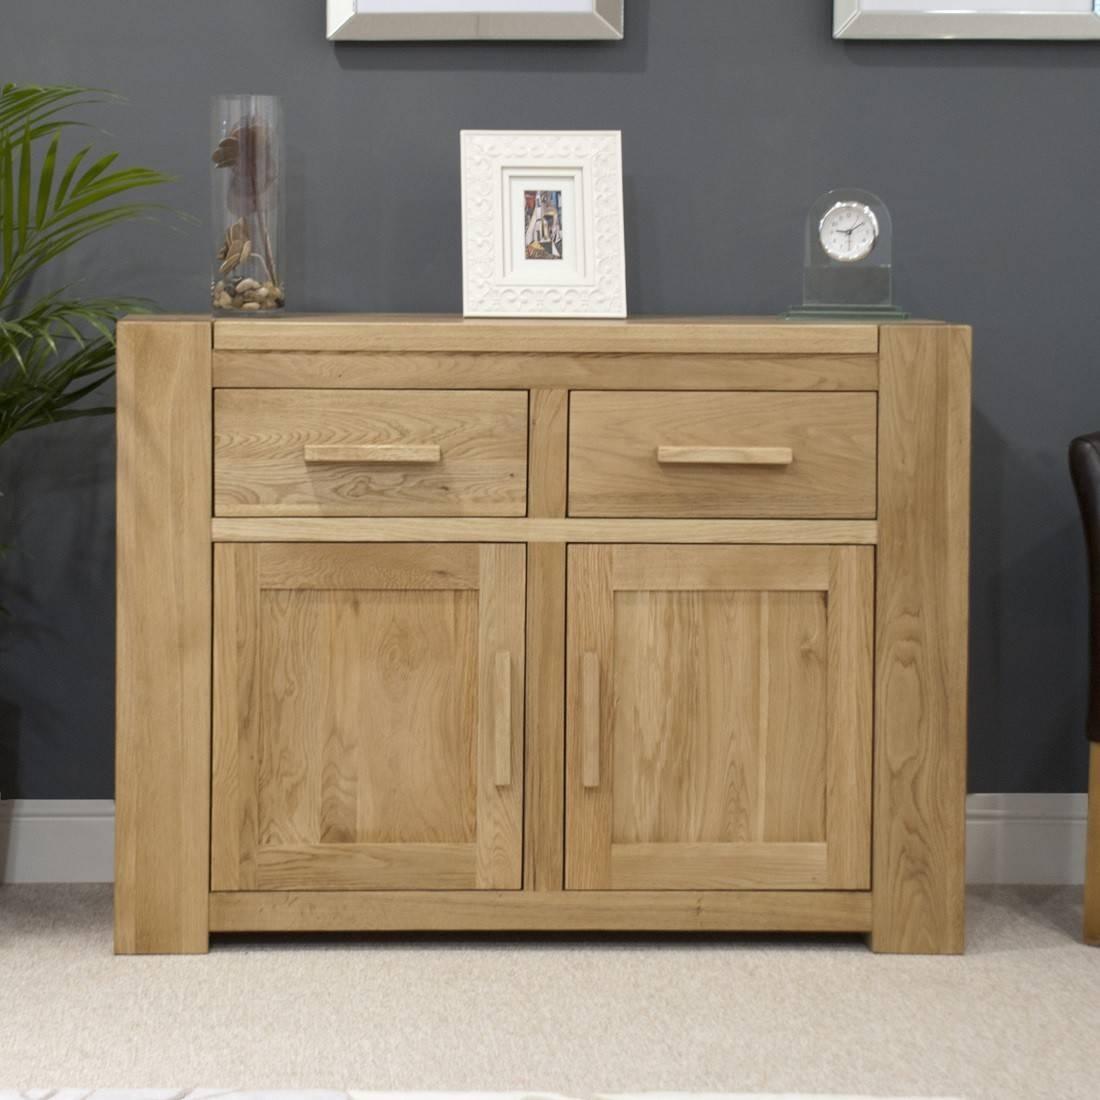 Oak Sideboards | Oak Furniture Uk Intended For Oak Sideboard Uk (View 6 of 20)